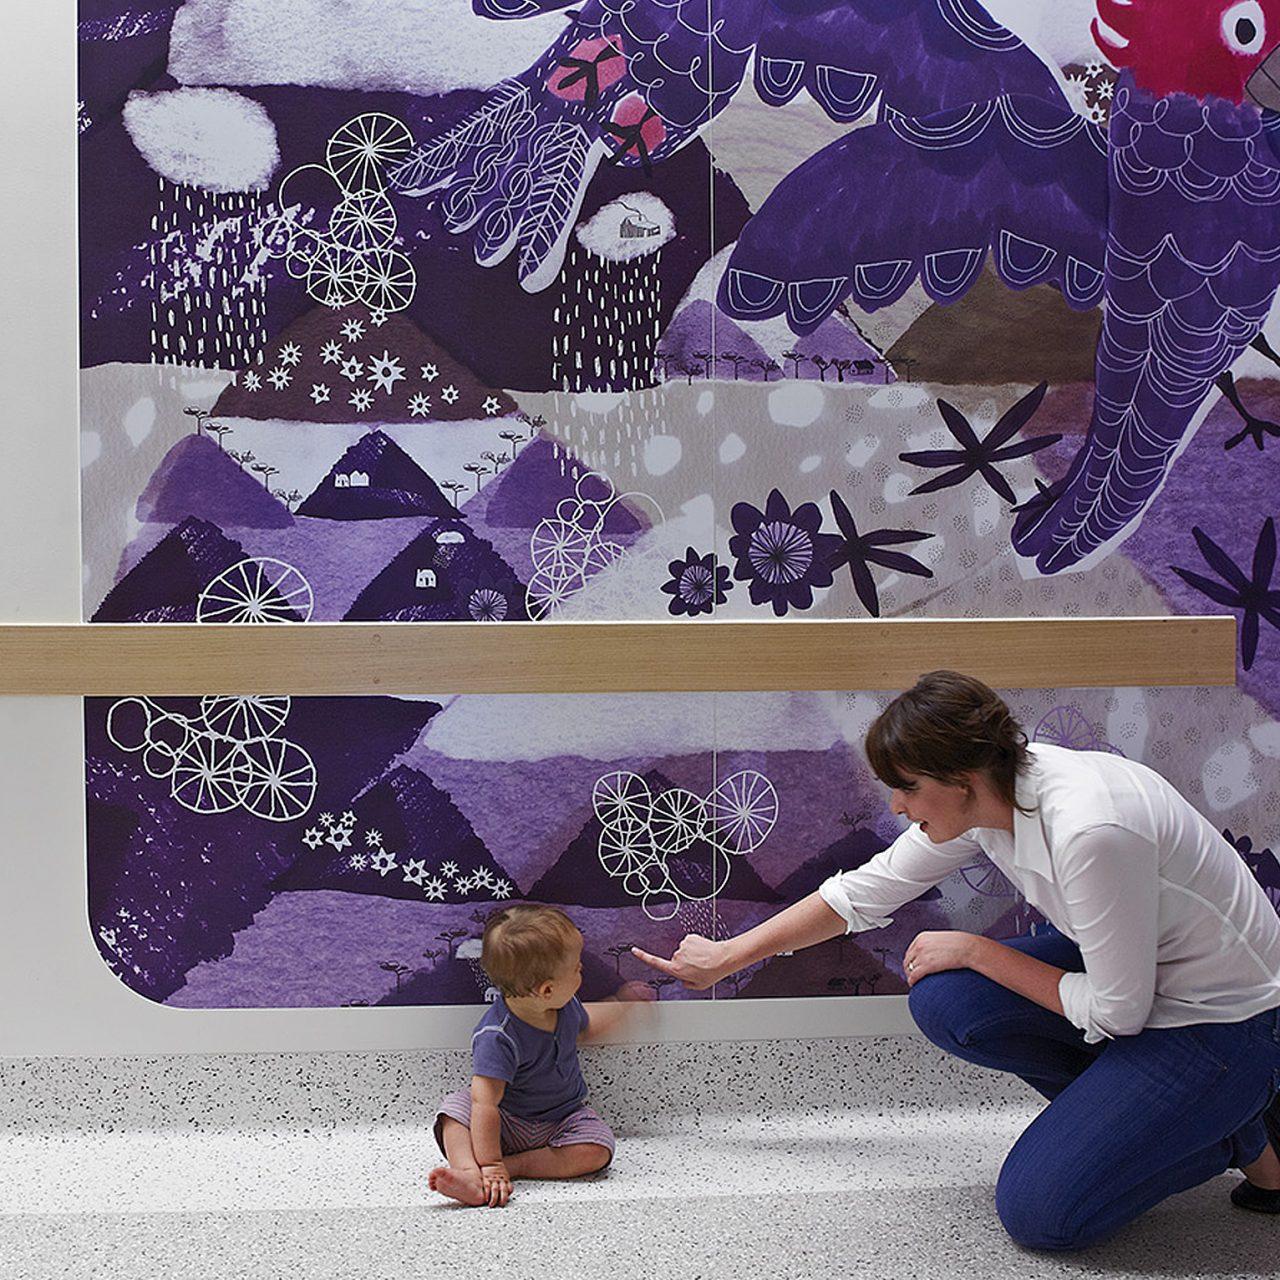 Supergraphics for Royal Children's Hospital